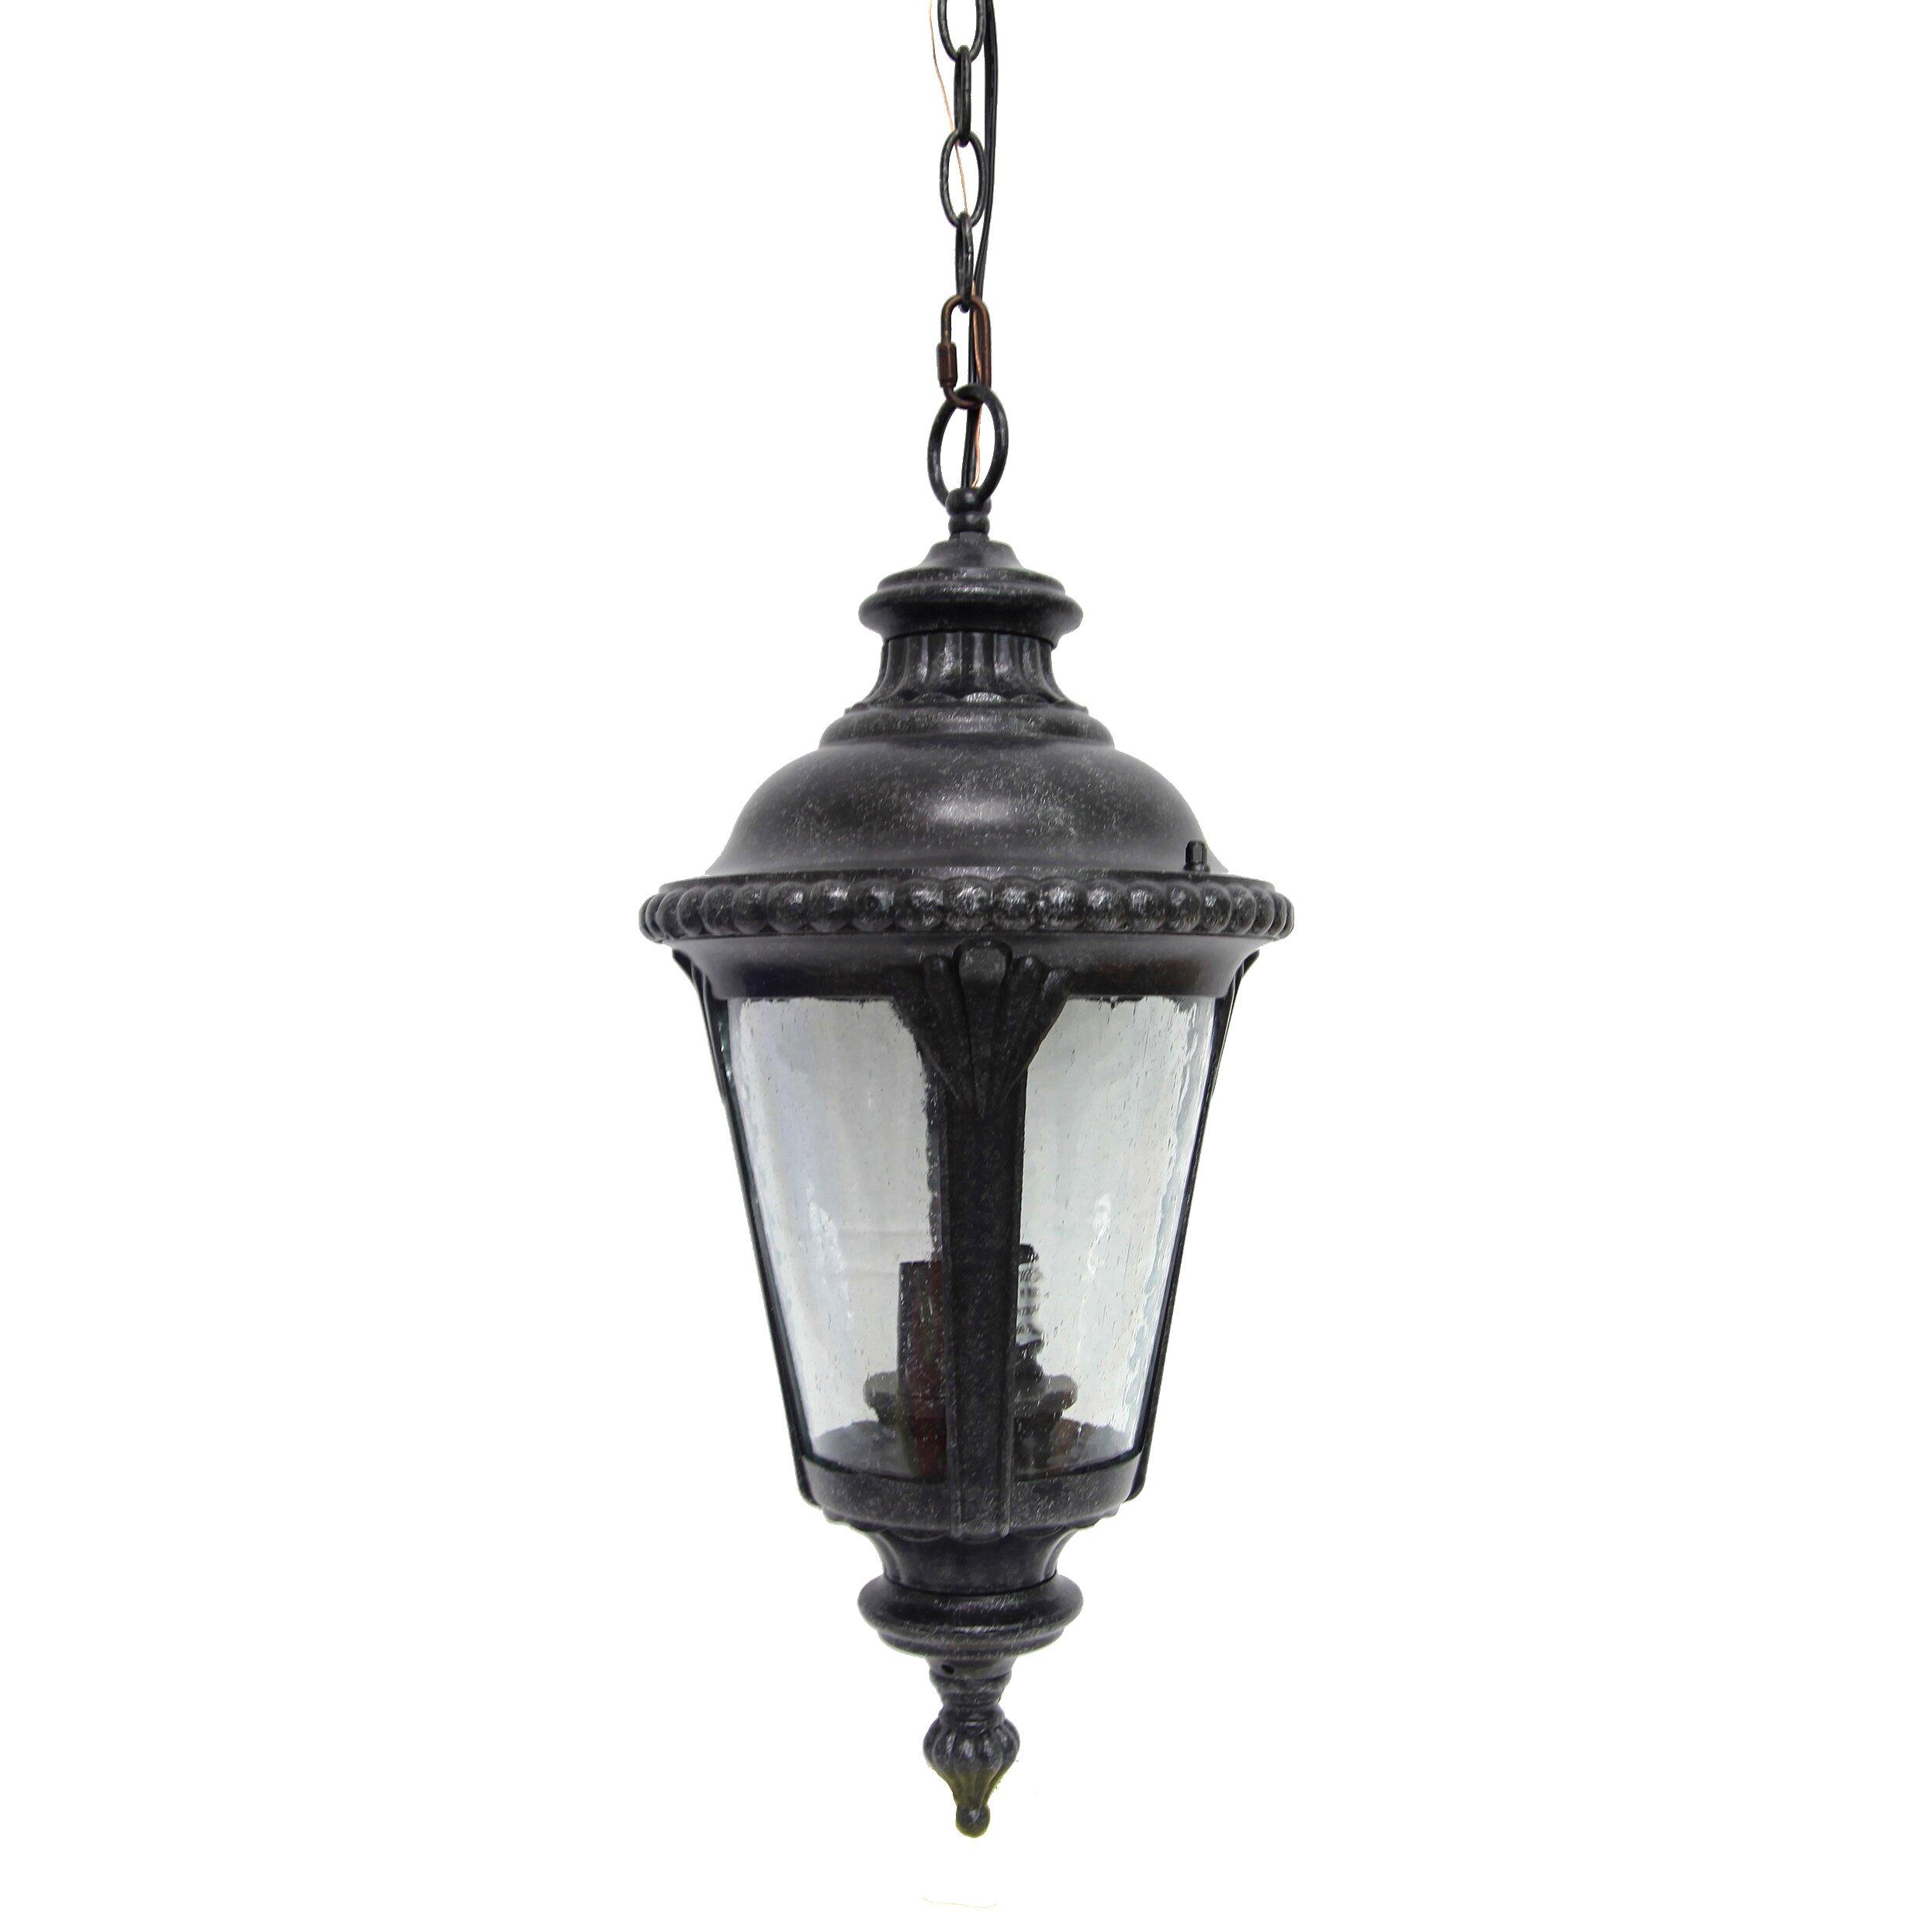 Wayfair Outdoor Hanging Lights: Y Decor Dallin 1 Light Outdoor Hanging Lantern